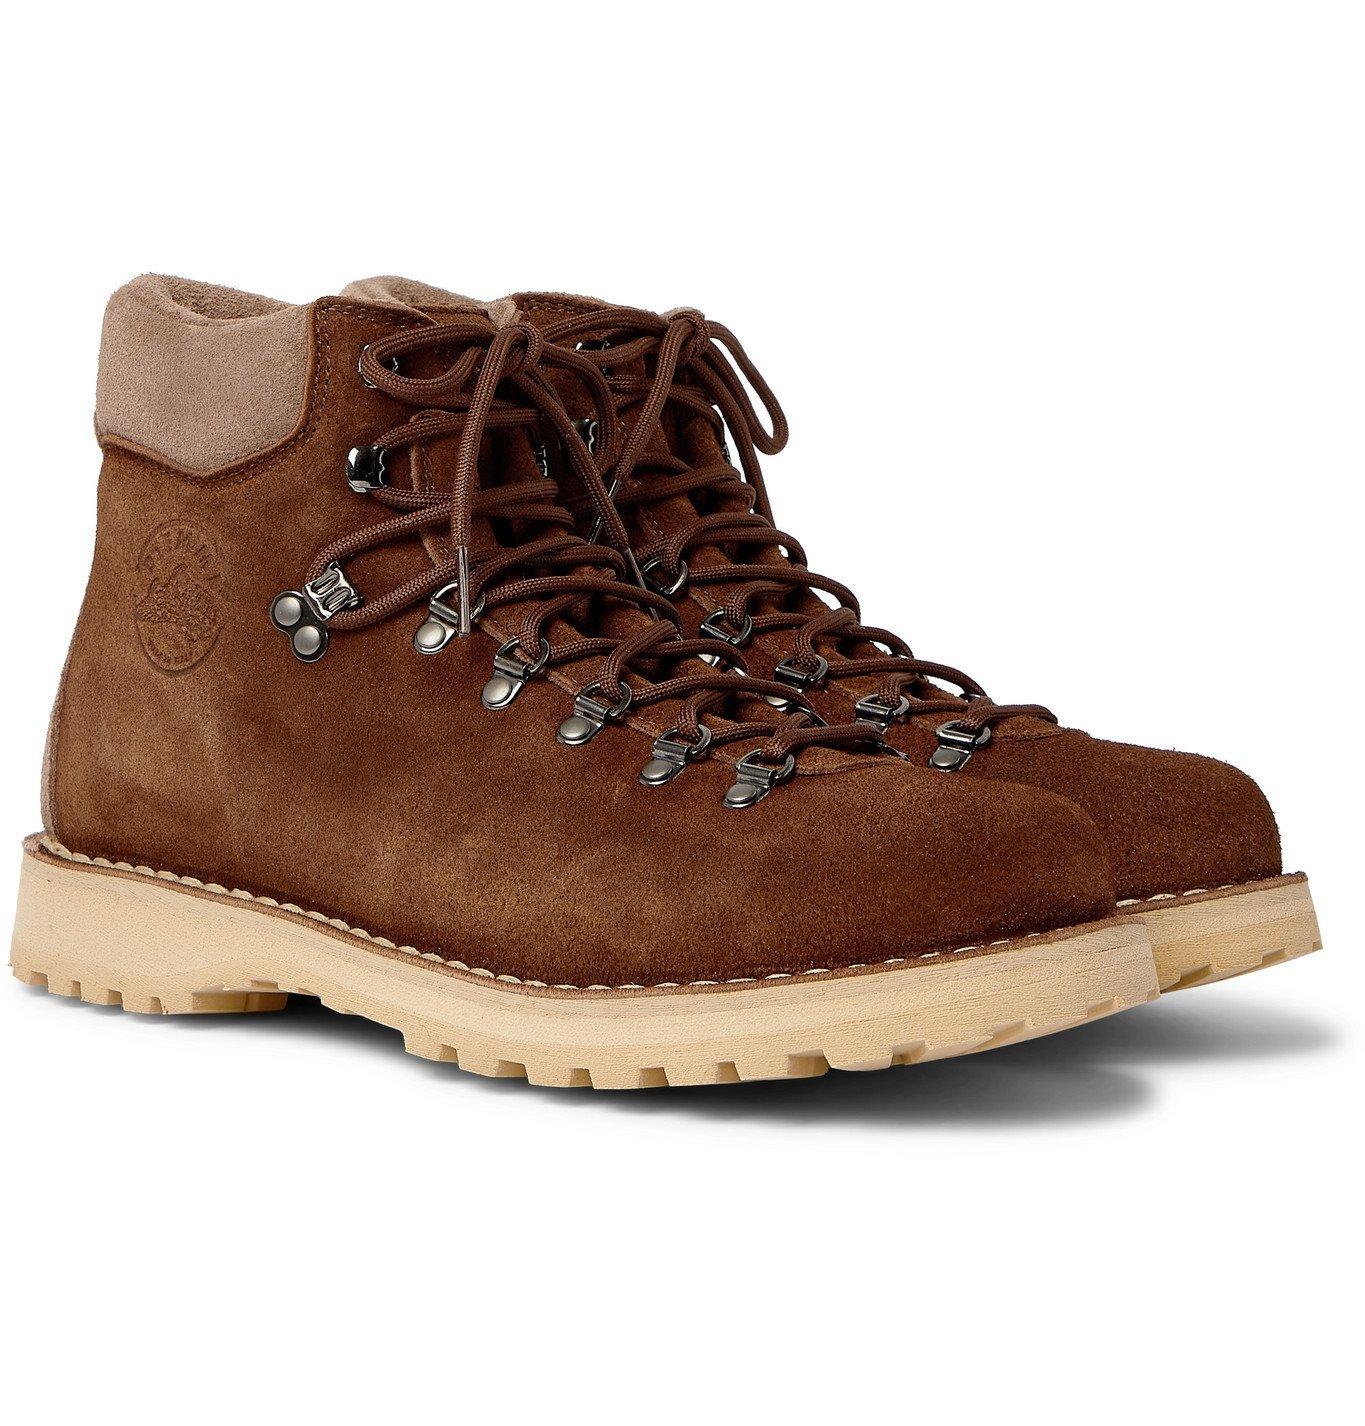 Photo: DIEMME - Roccia Vet Suede Hiking Boots - Brown